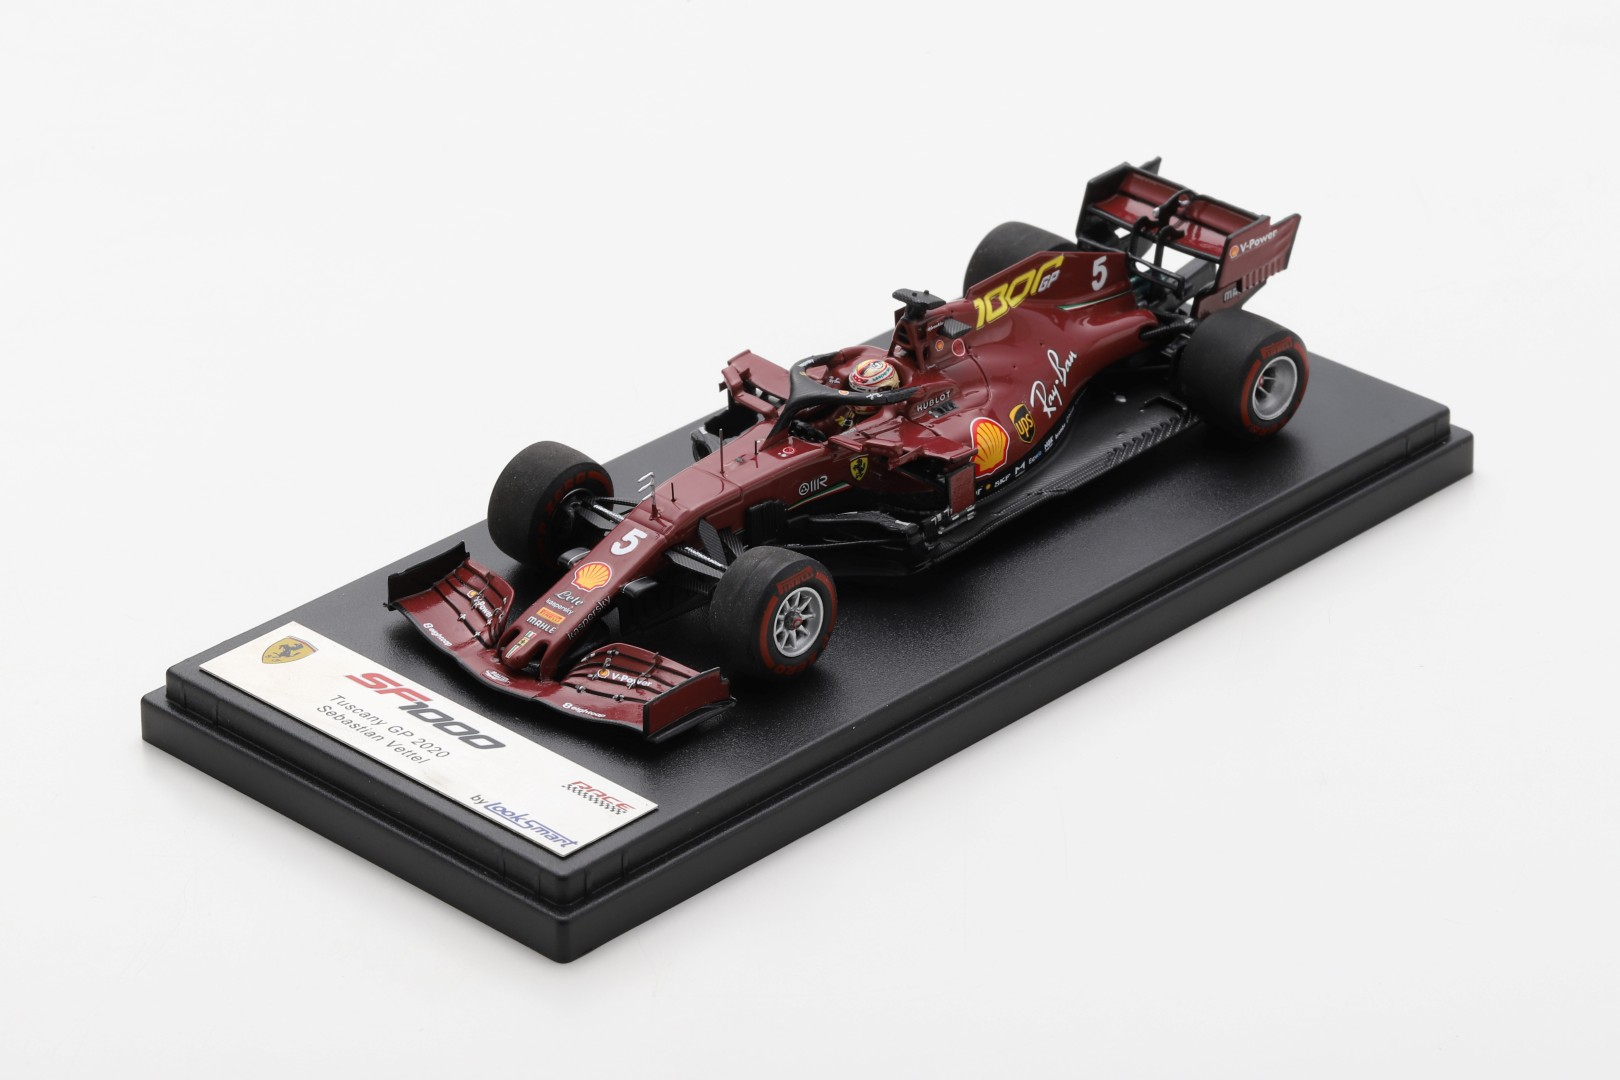 Ferrari Sf1000 Tuscany Gp 2020 Vettel 1 43 Looksmart Models